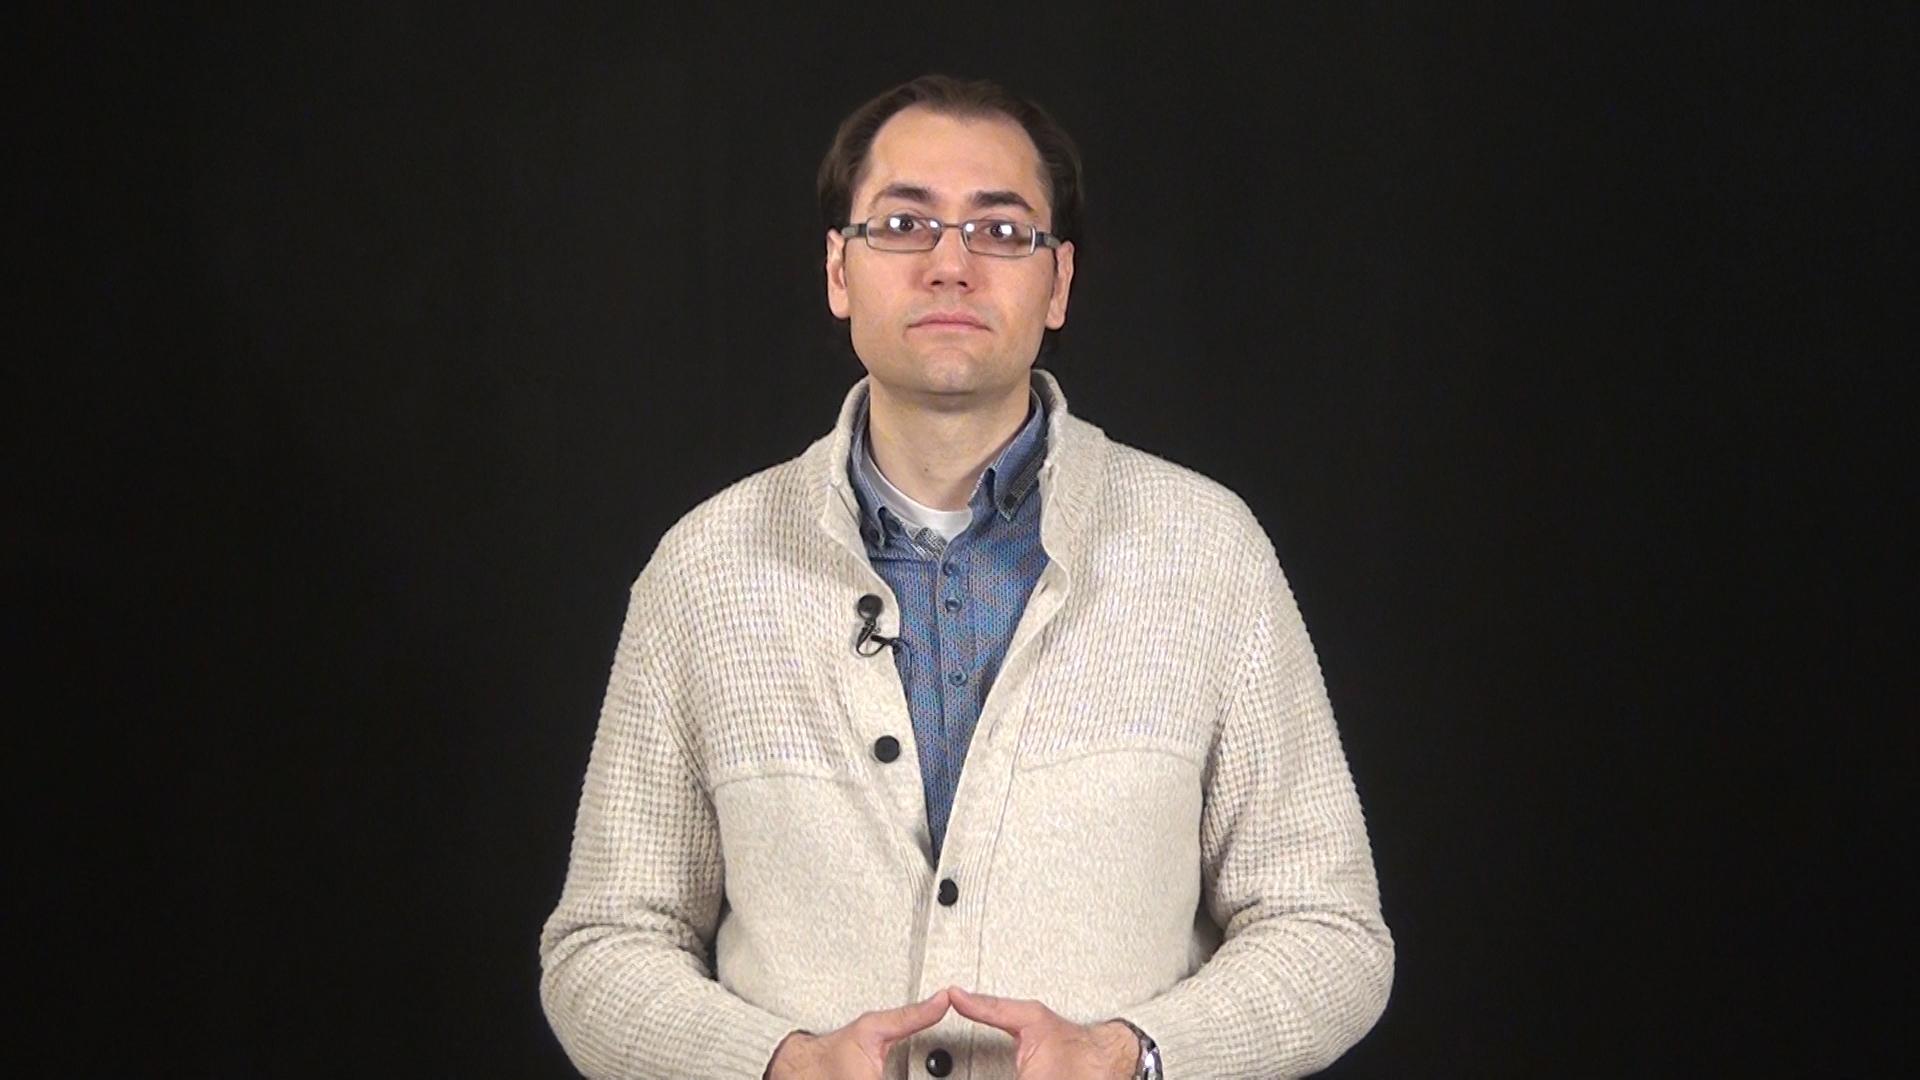 Juan Aparicio